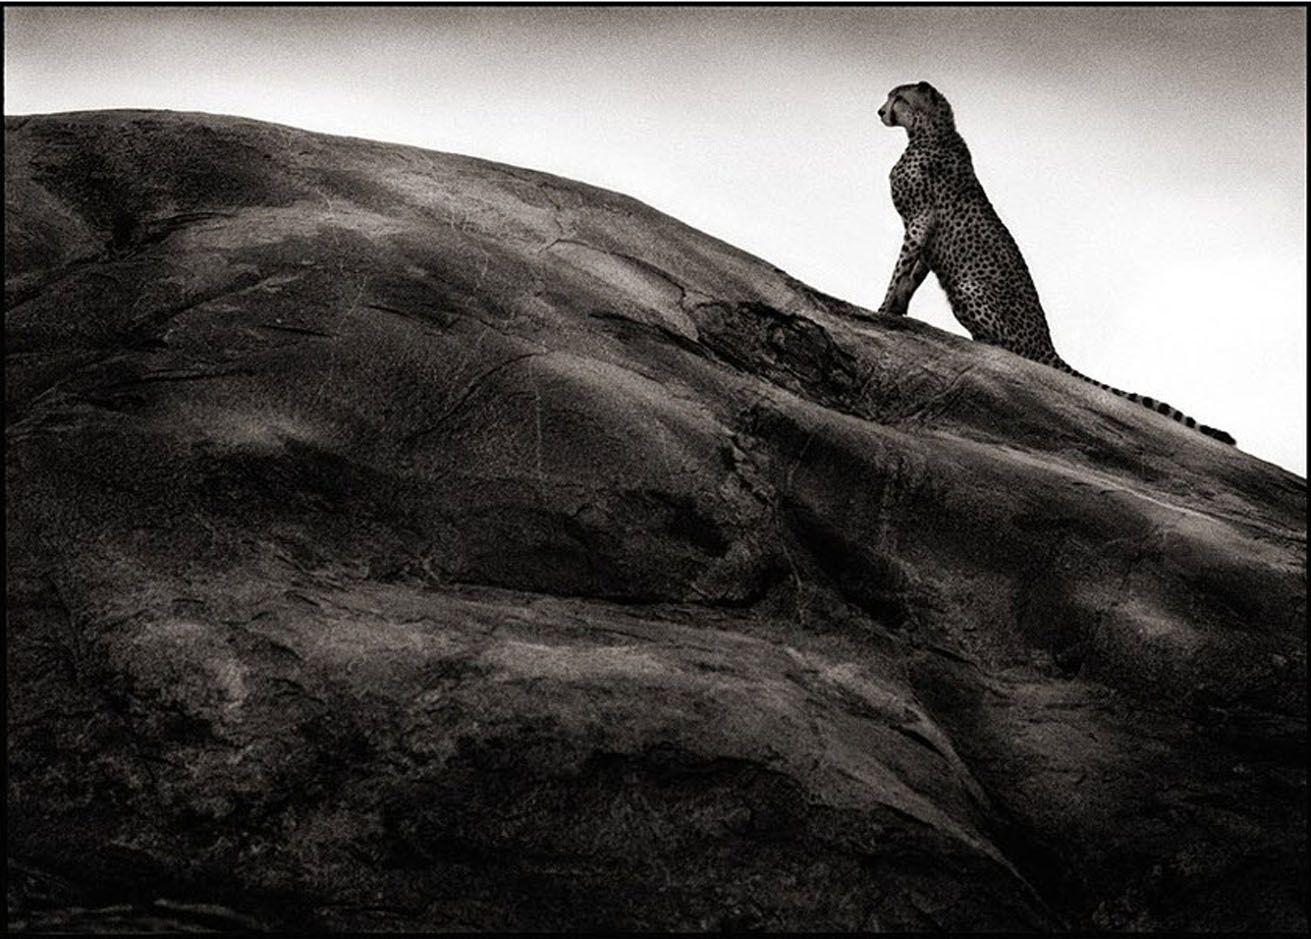 nick-brandt-cheetah-on-rock-serengeti-photographs-pigment-print-zoom.jpg 1.311×939 Pixel